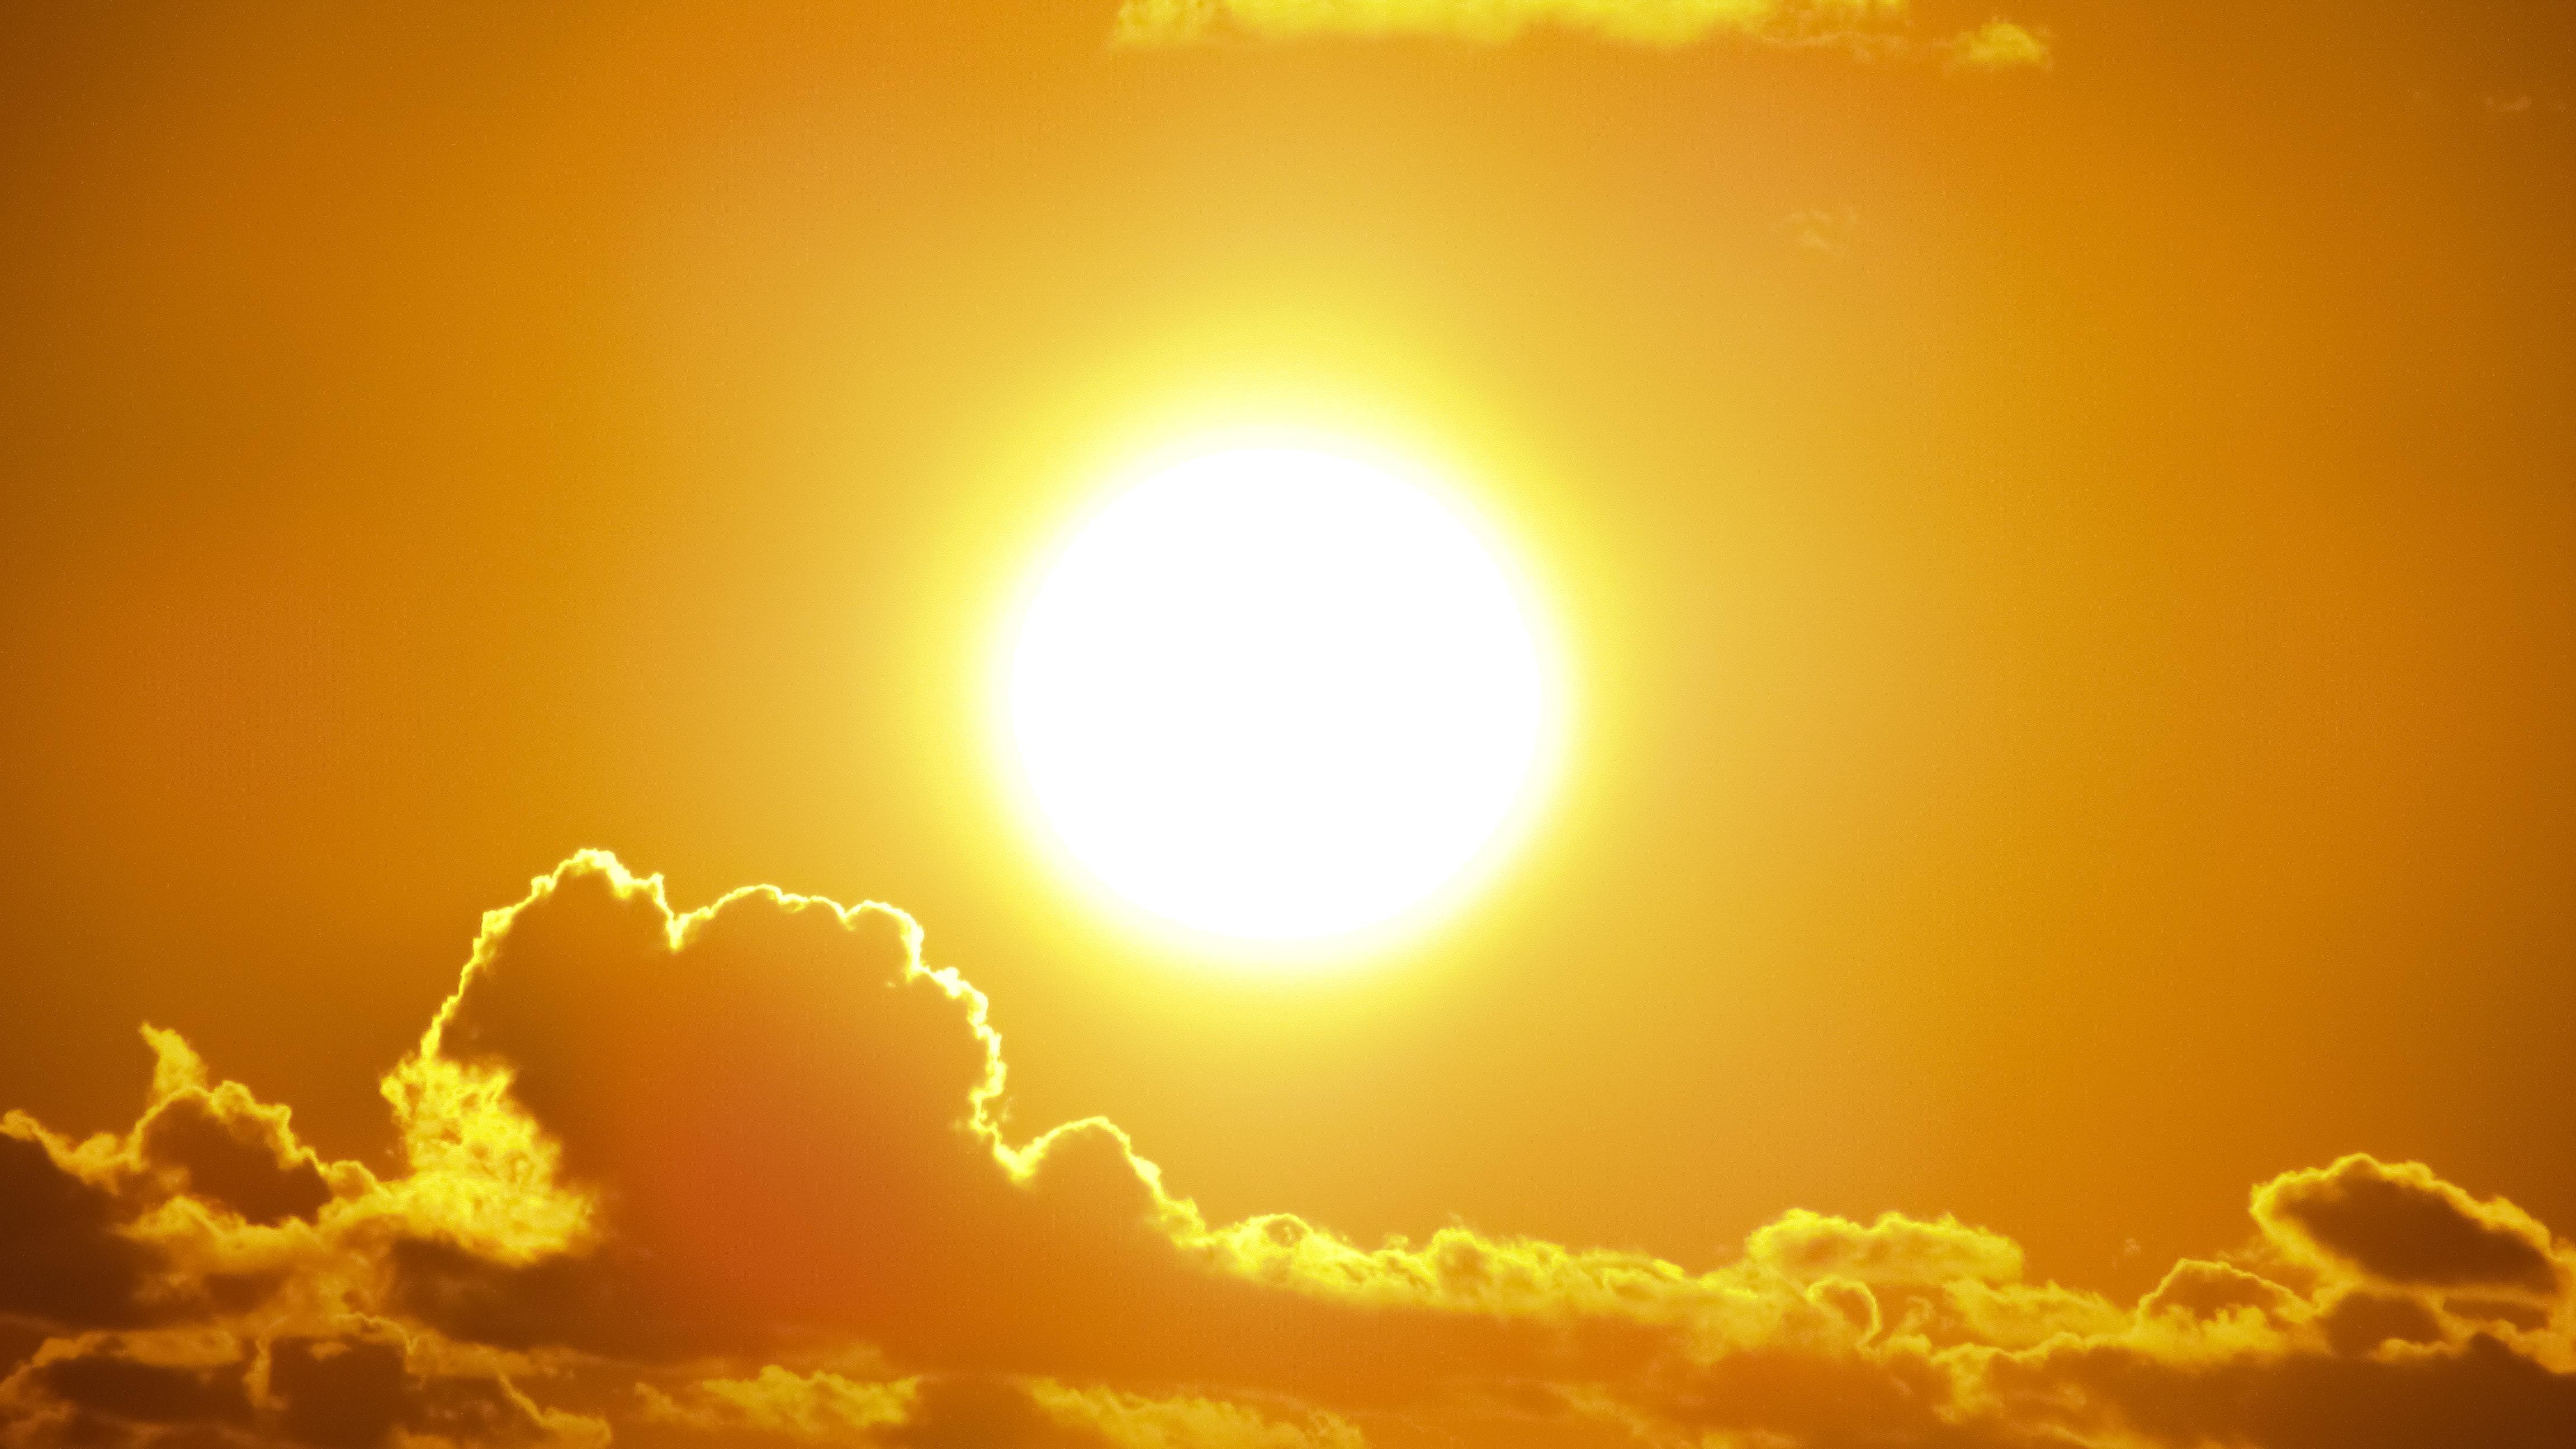 The of sun pics